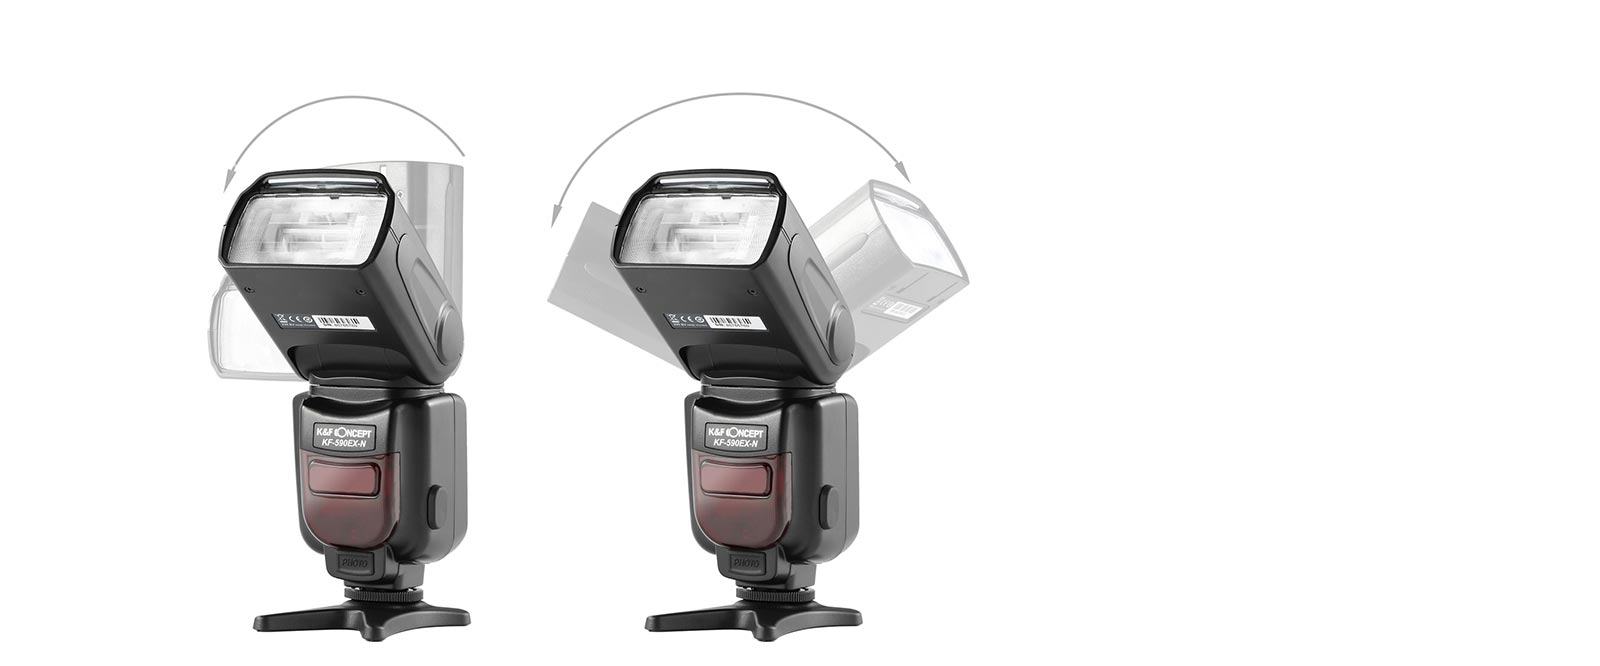 K&F Concept KF590N I-TTL Flash para Nikon GN56 Eslave